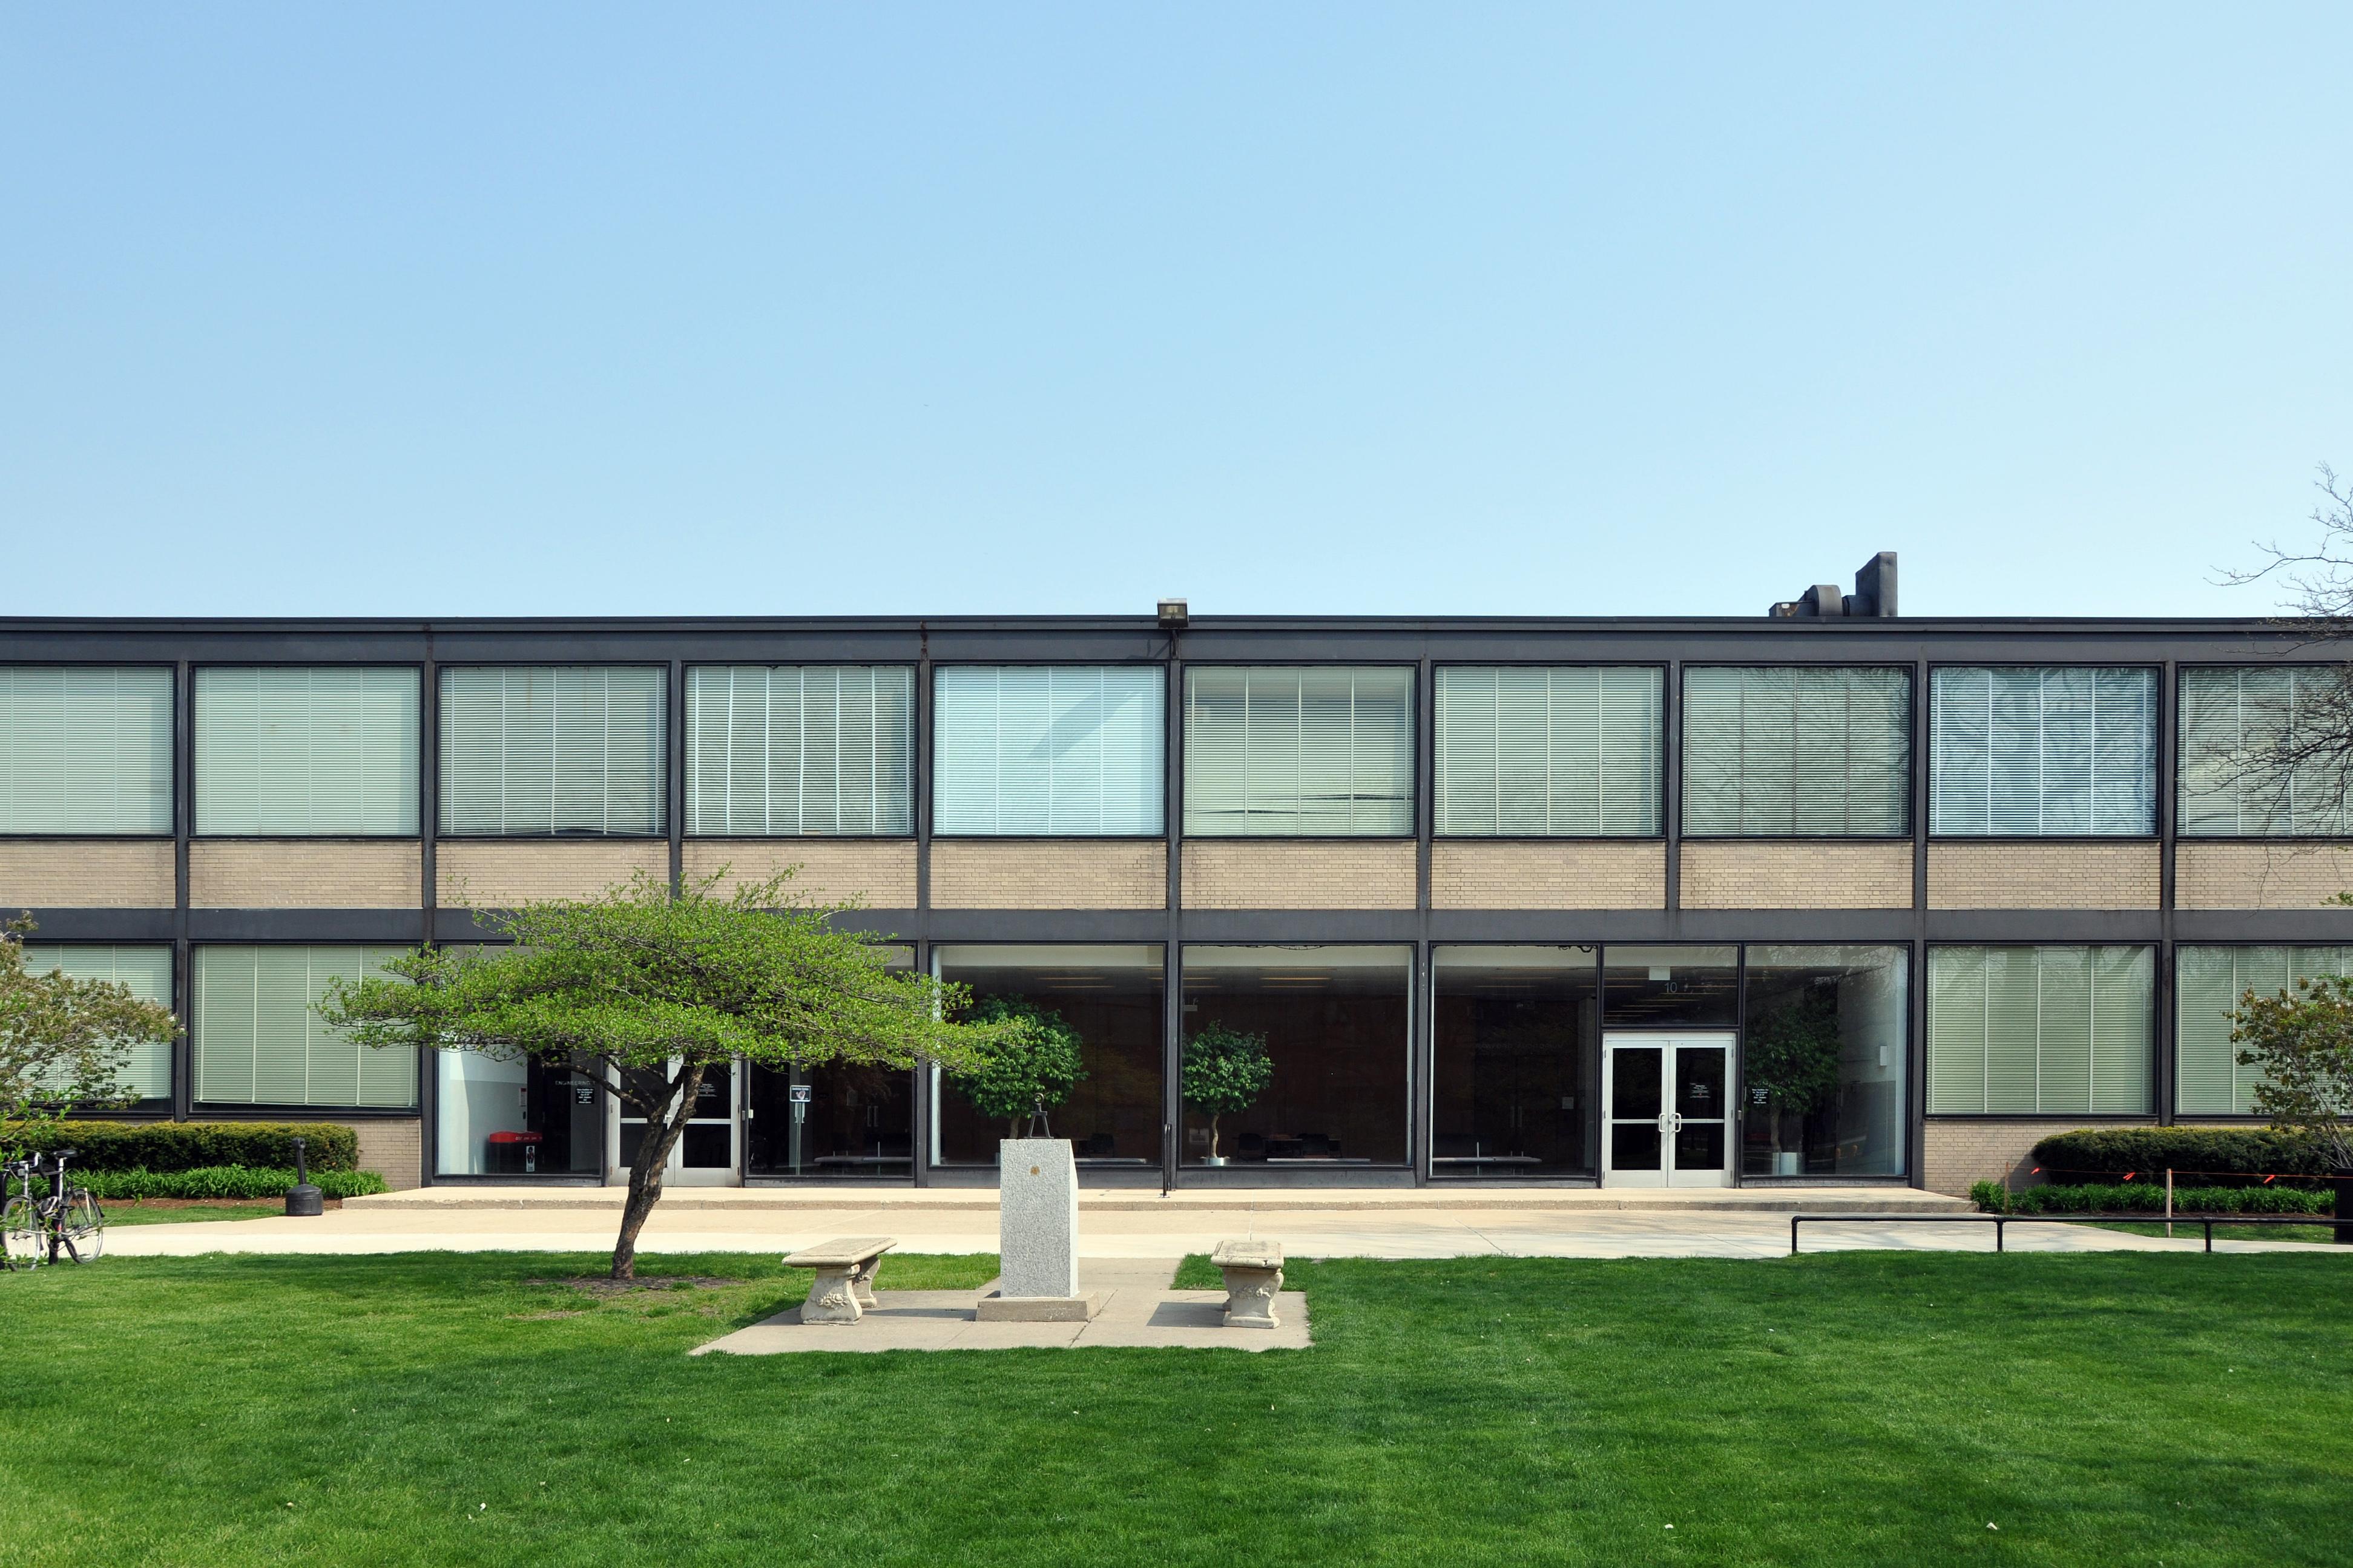 Villa tugendhat arkitalker mies van der rohe - Mies Van Der Rohe Alumni Memorial Hall At Illinois Institute Of Technology Chicago 1944 45 Mies Van Der Rohe Pinterest Wood Architecture